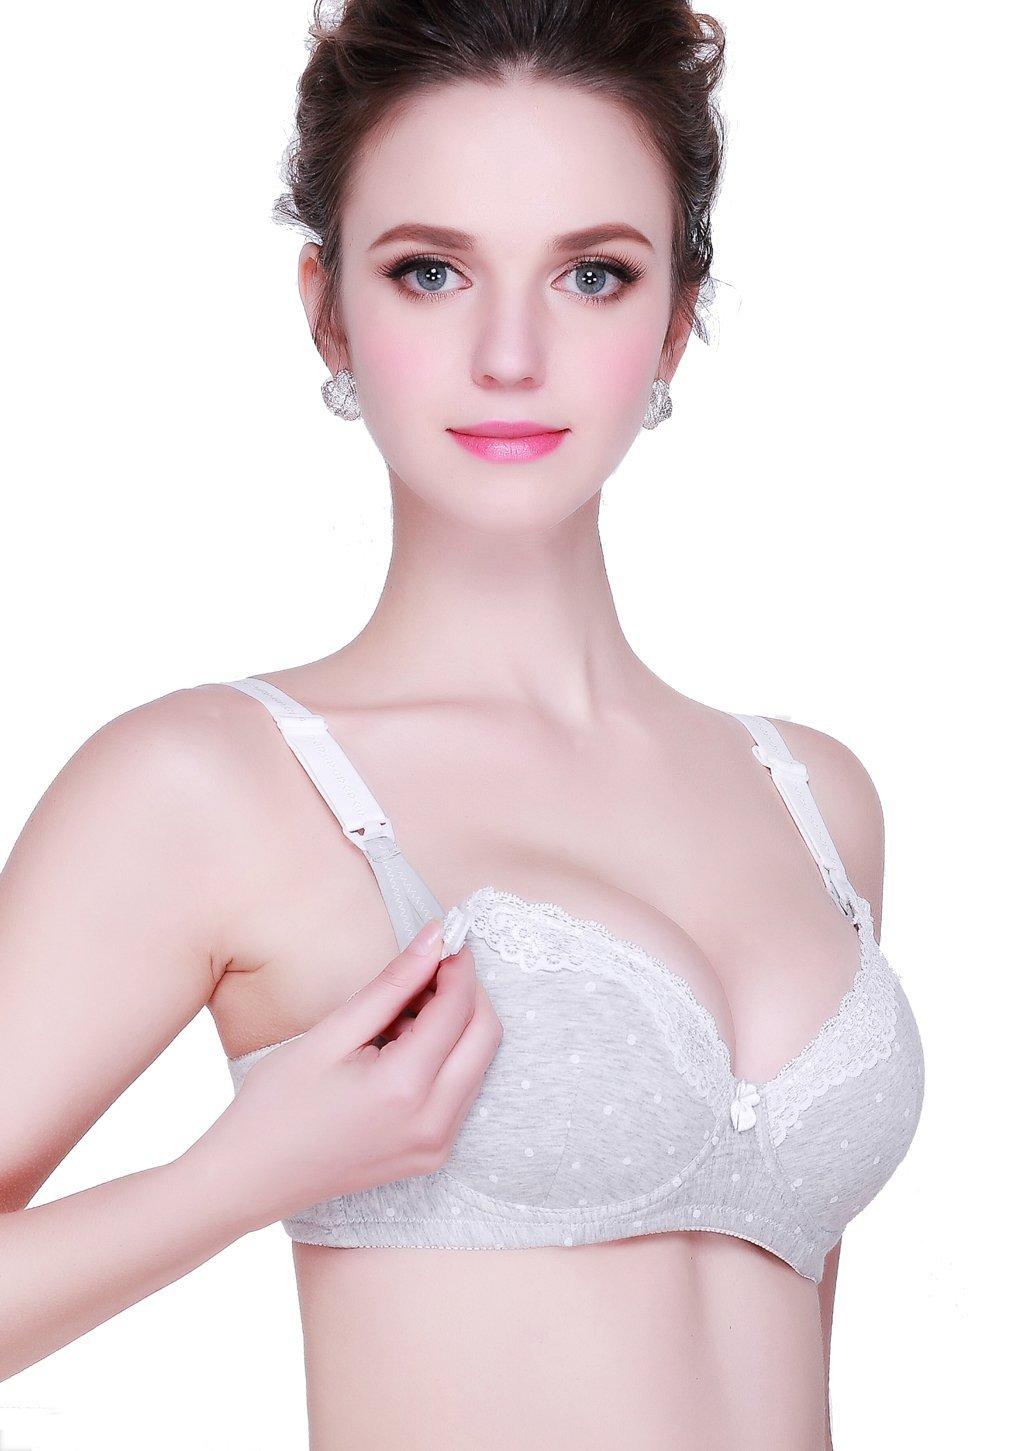 KOOYOL Nursing Maternity Bra Women Cotton Underwire Push up Bra for Breastfeeding